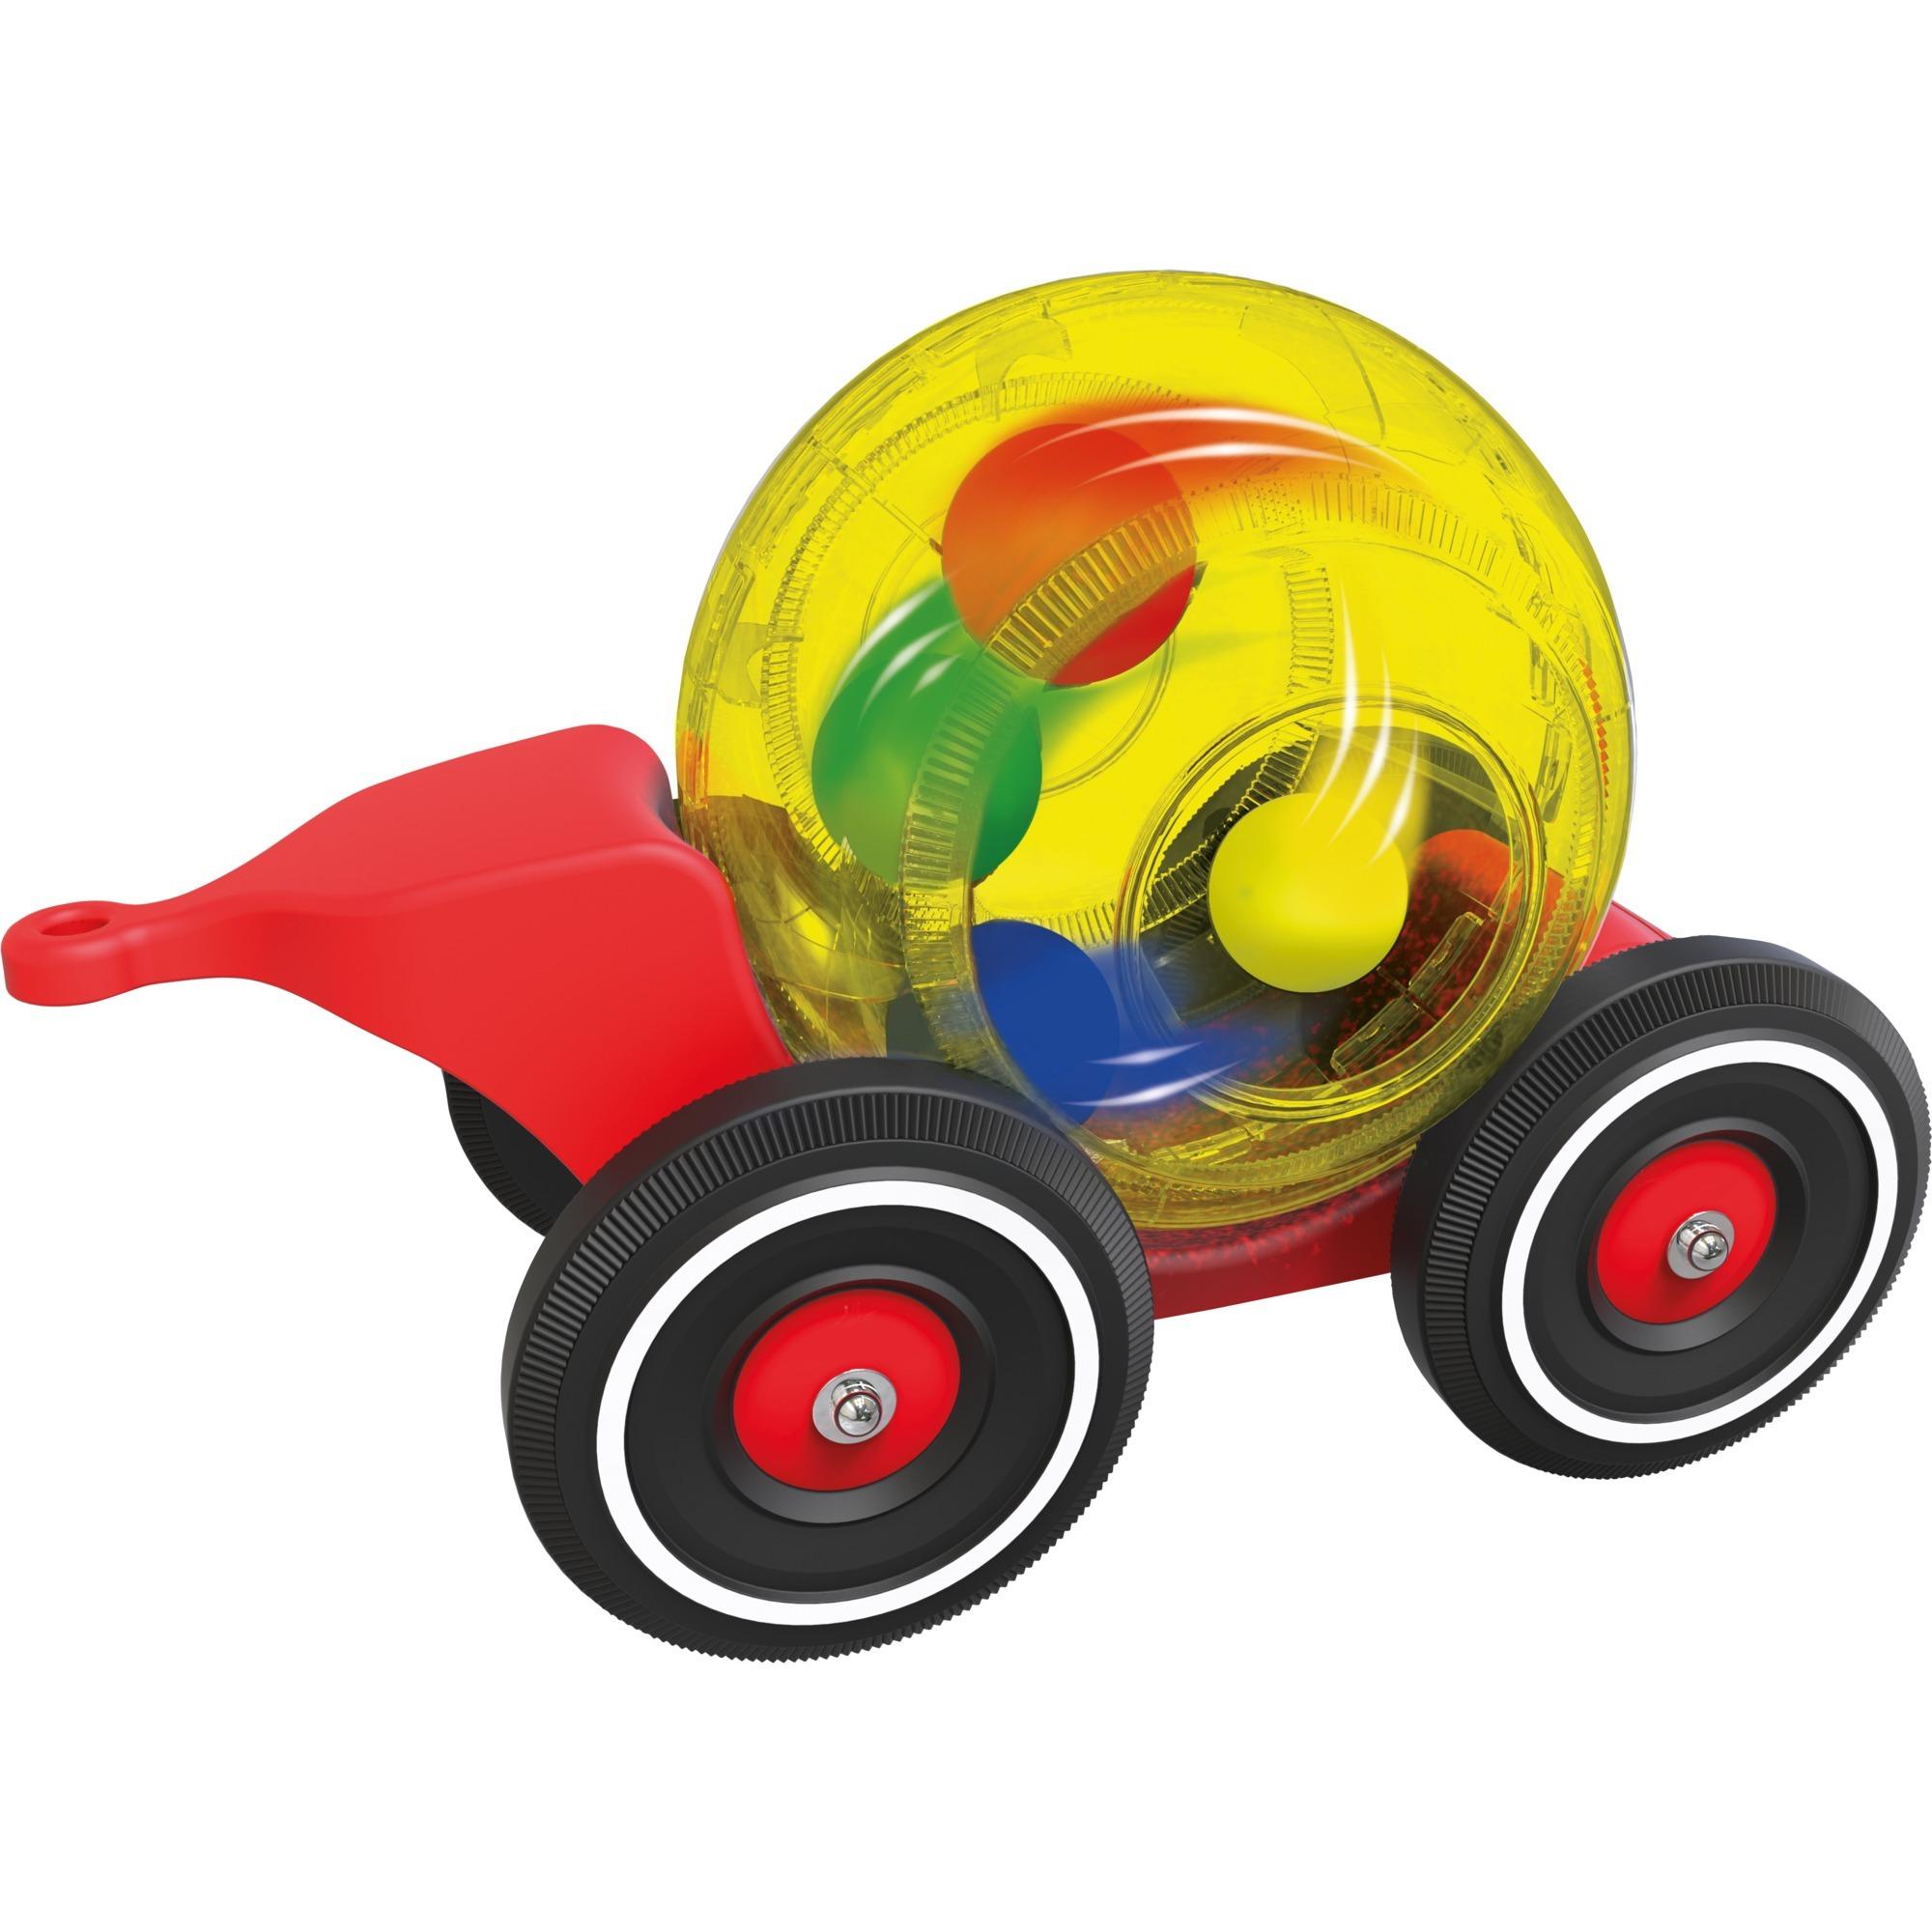 Spielzeug Bobby Car Big Bobby Car Mix Trailer Kinderfahrzeug Anhänger Für Bobby Car